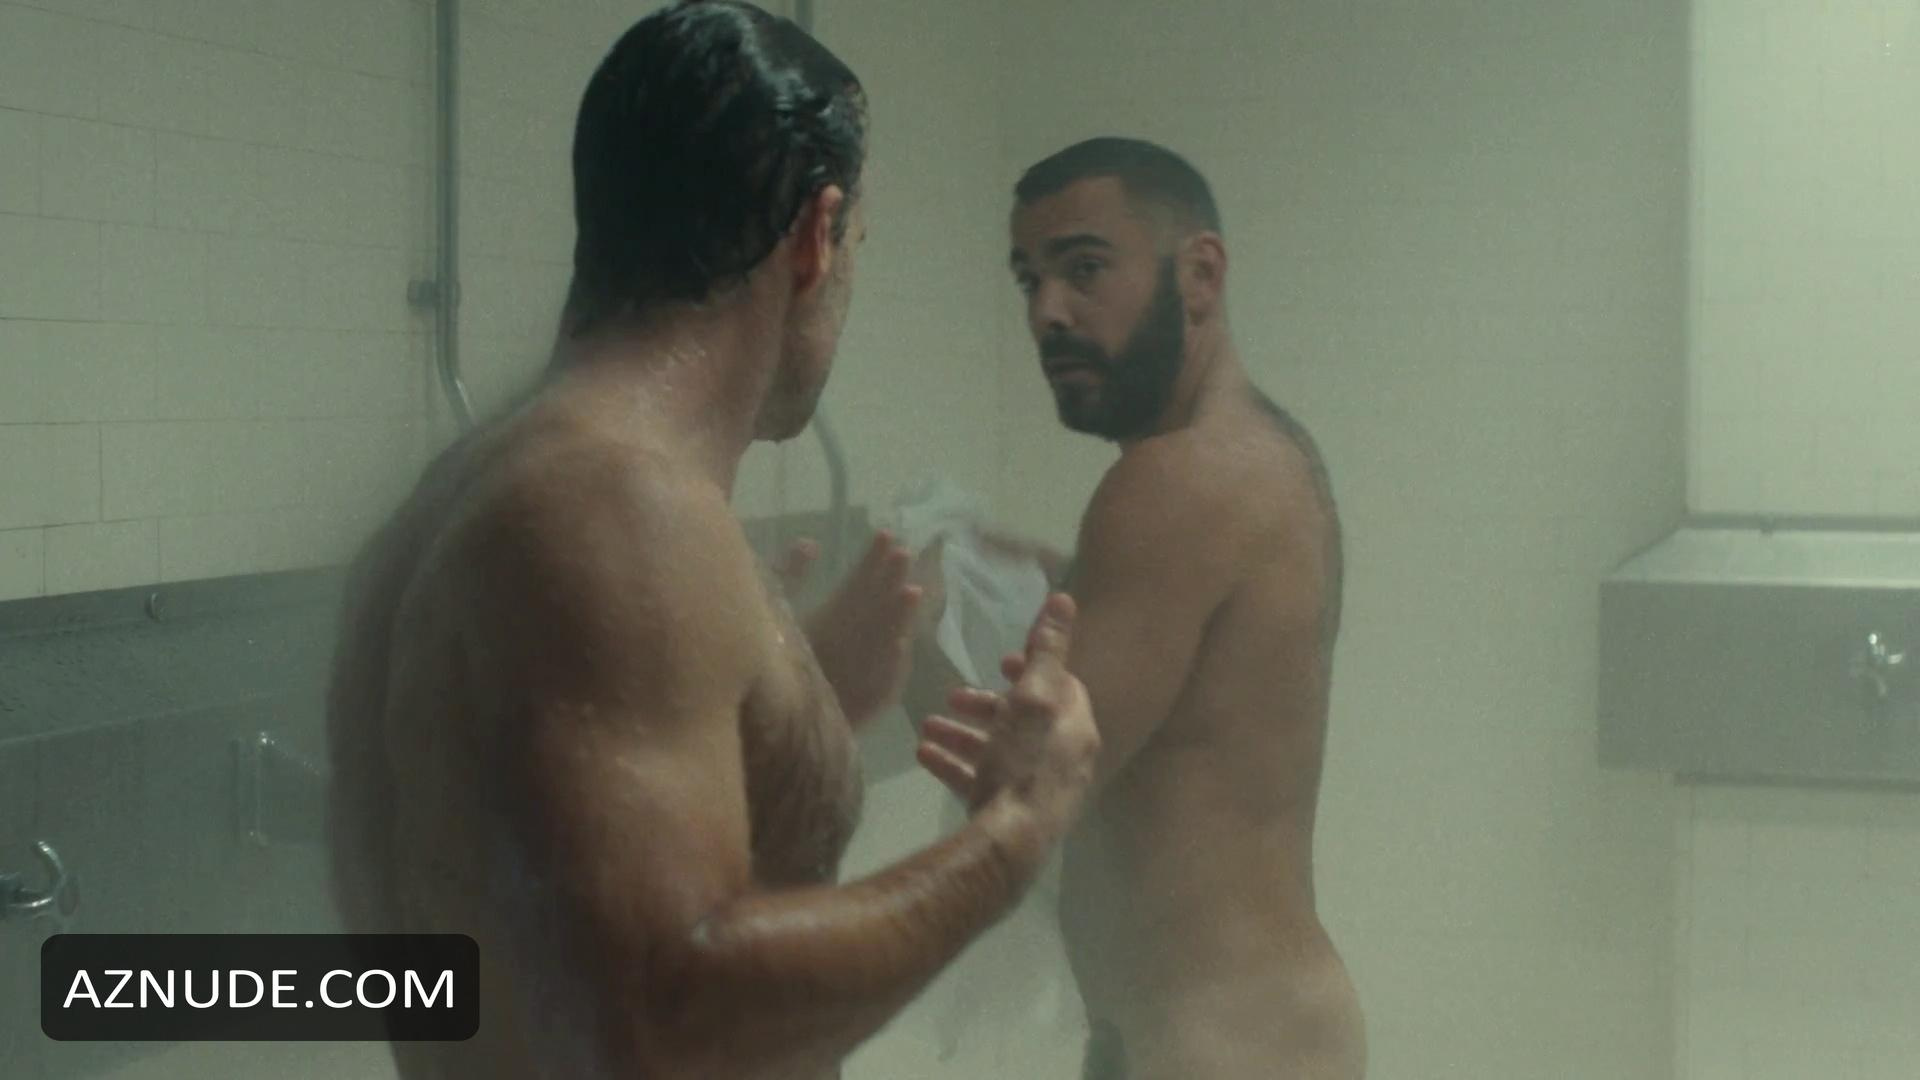 MATTHEW RISCH Nude  AZNude Men